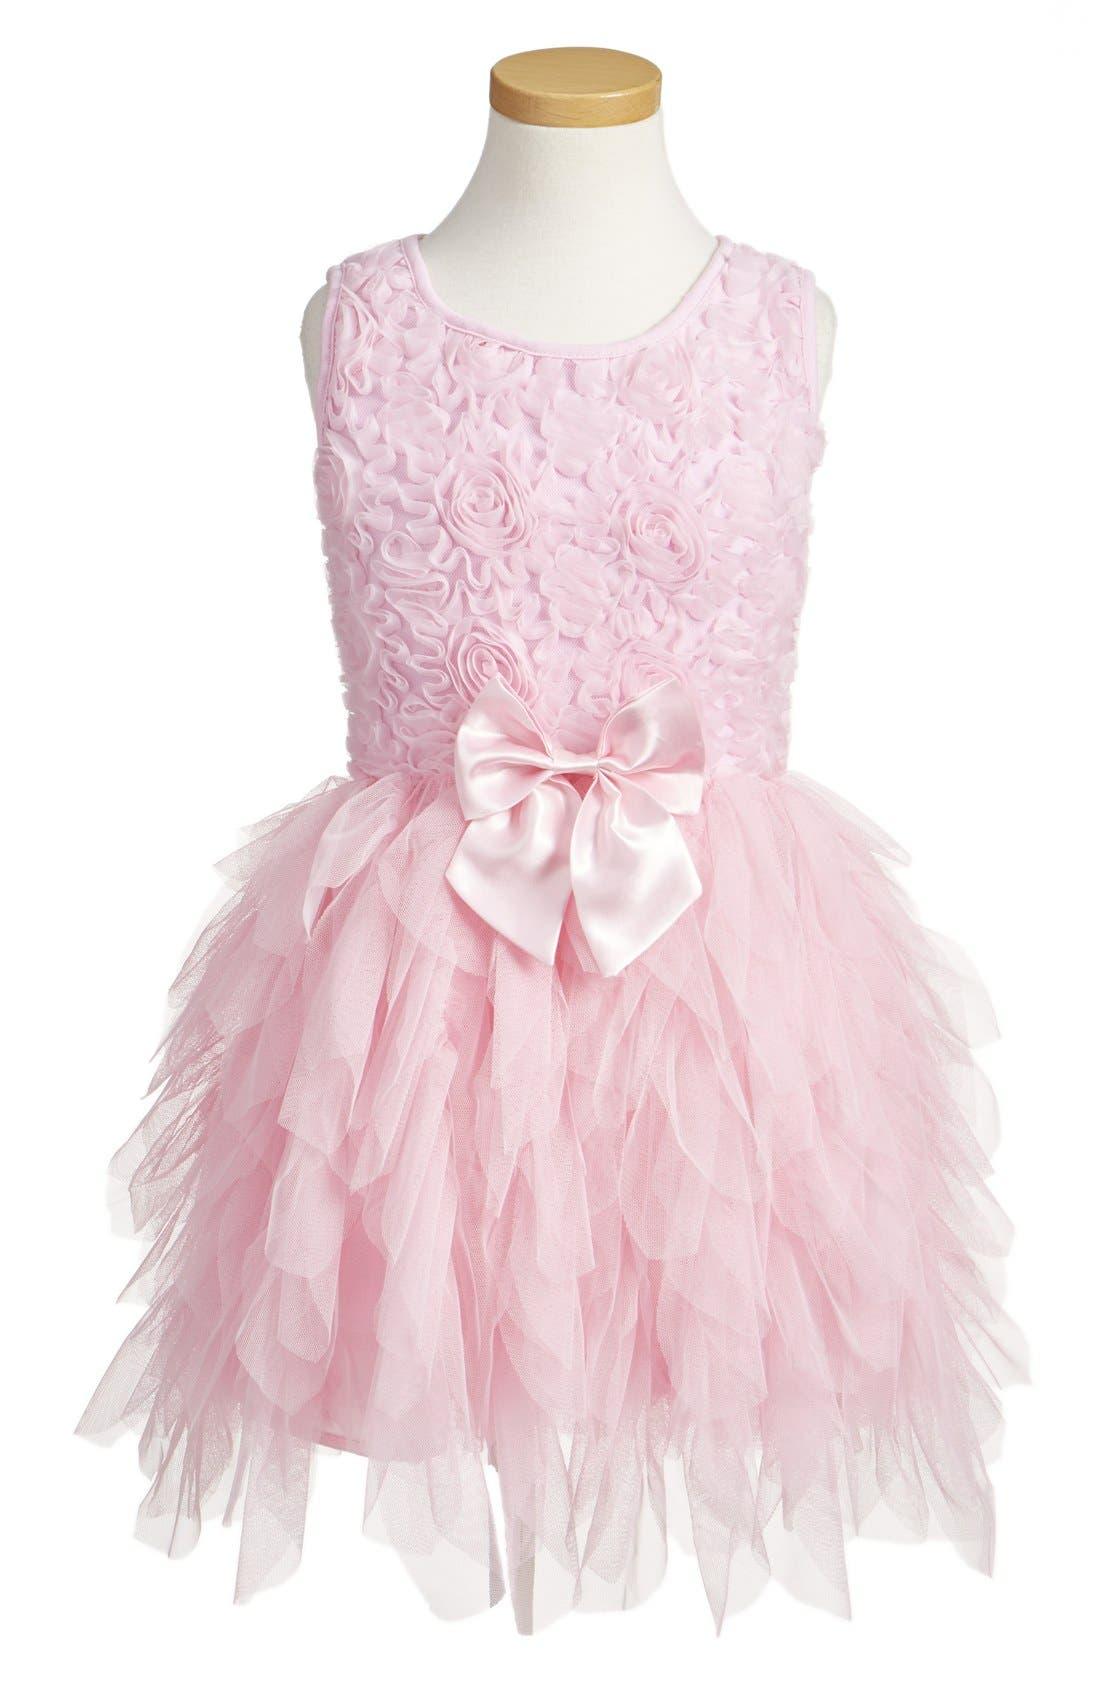 Ribbon Rosette Sleeveless Tulle Dress,                             Main thumbnail 1, color,                             650